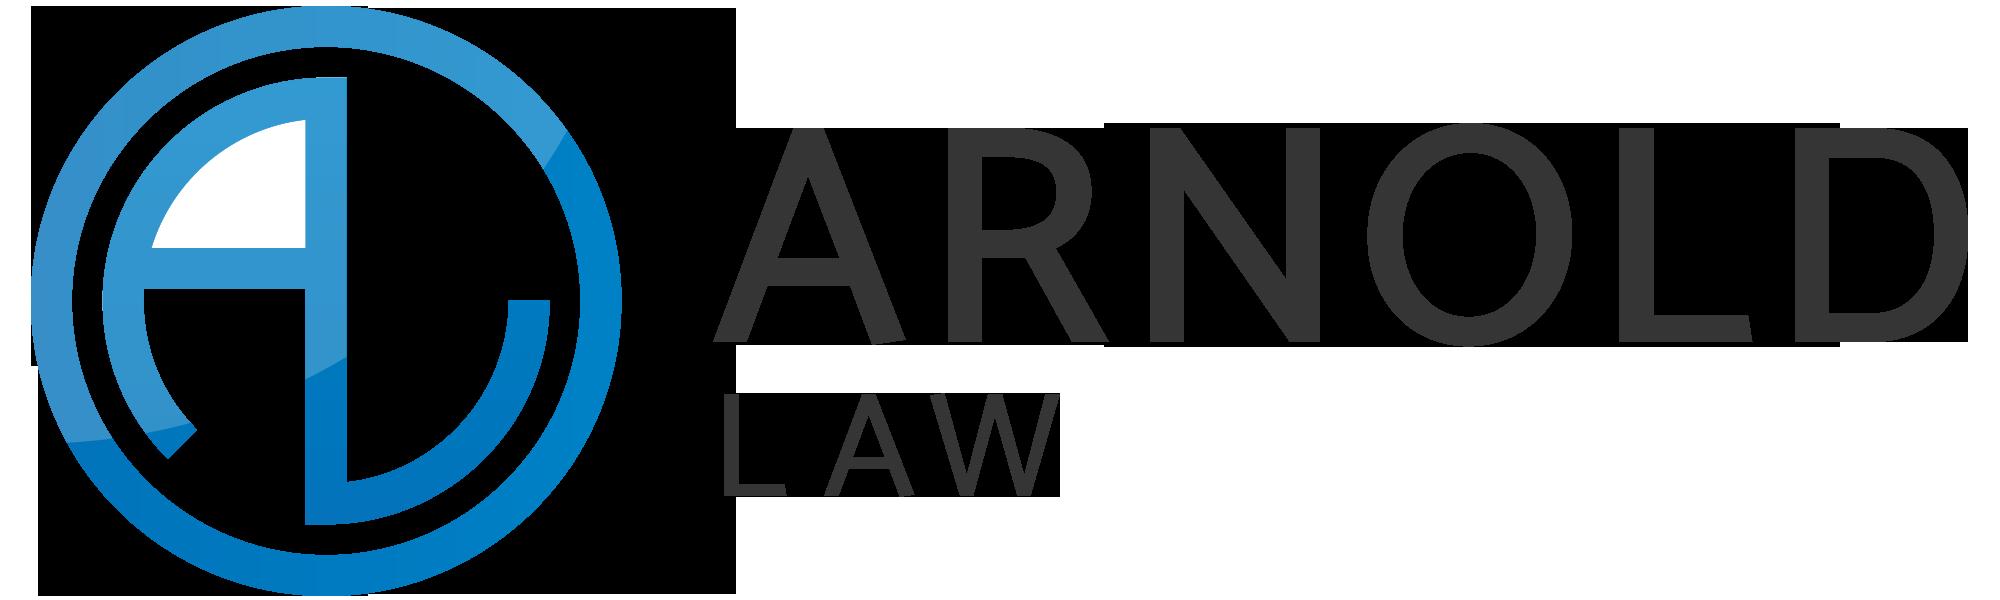 criminal lawyer family law real estate law arnold law. Black Bedroom Furniture Sets. Home Design Ideas